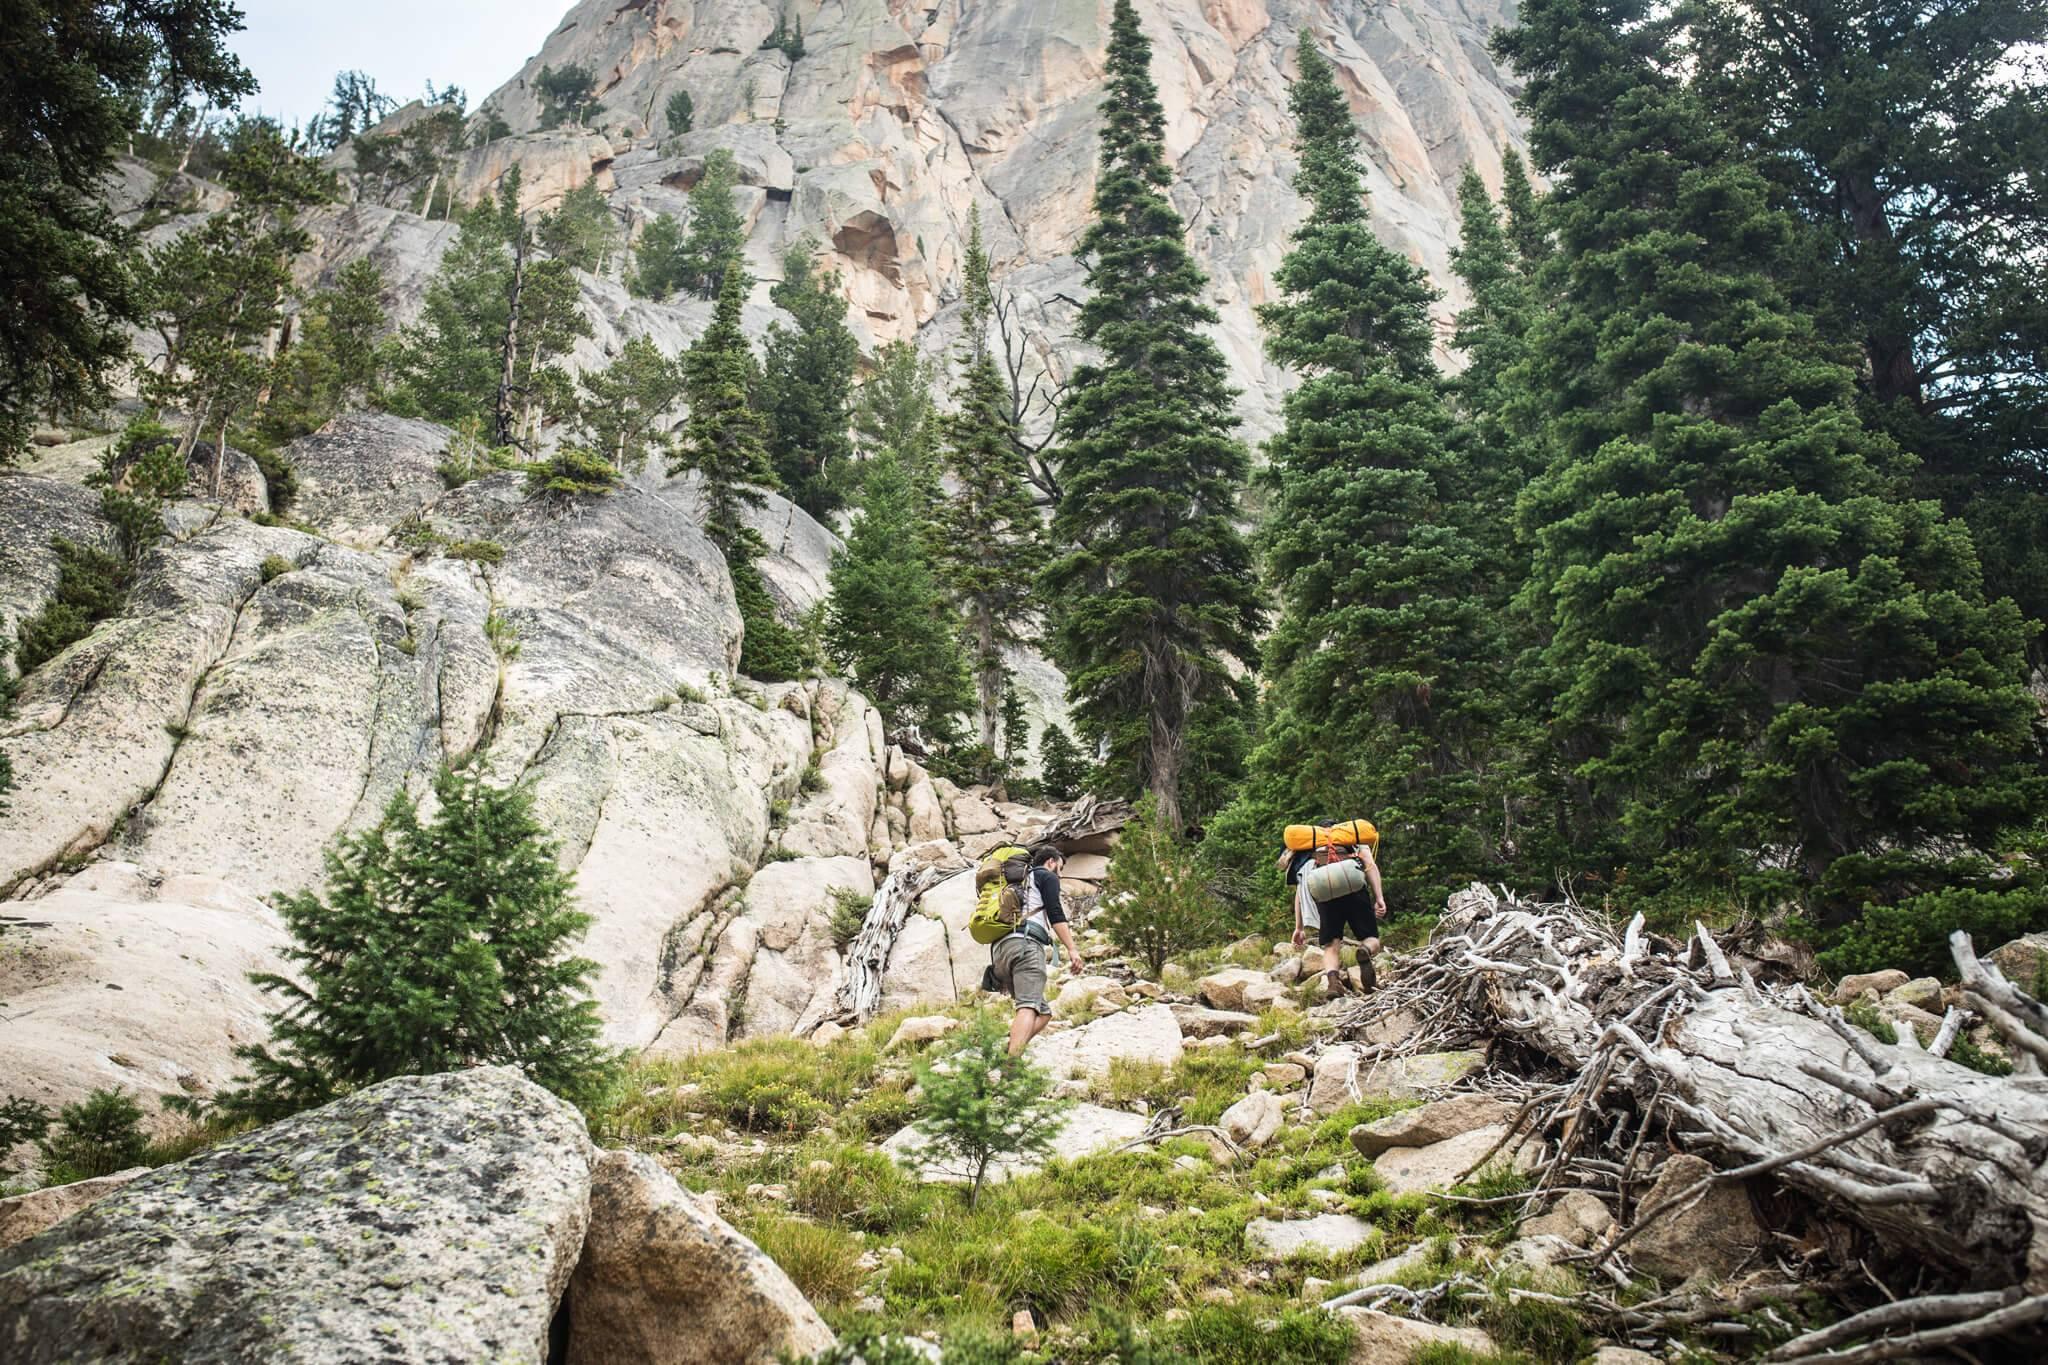 Hiking, Elephant's Perch, Near Stanley. Photo Credit: Idaho Tourism